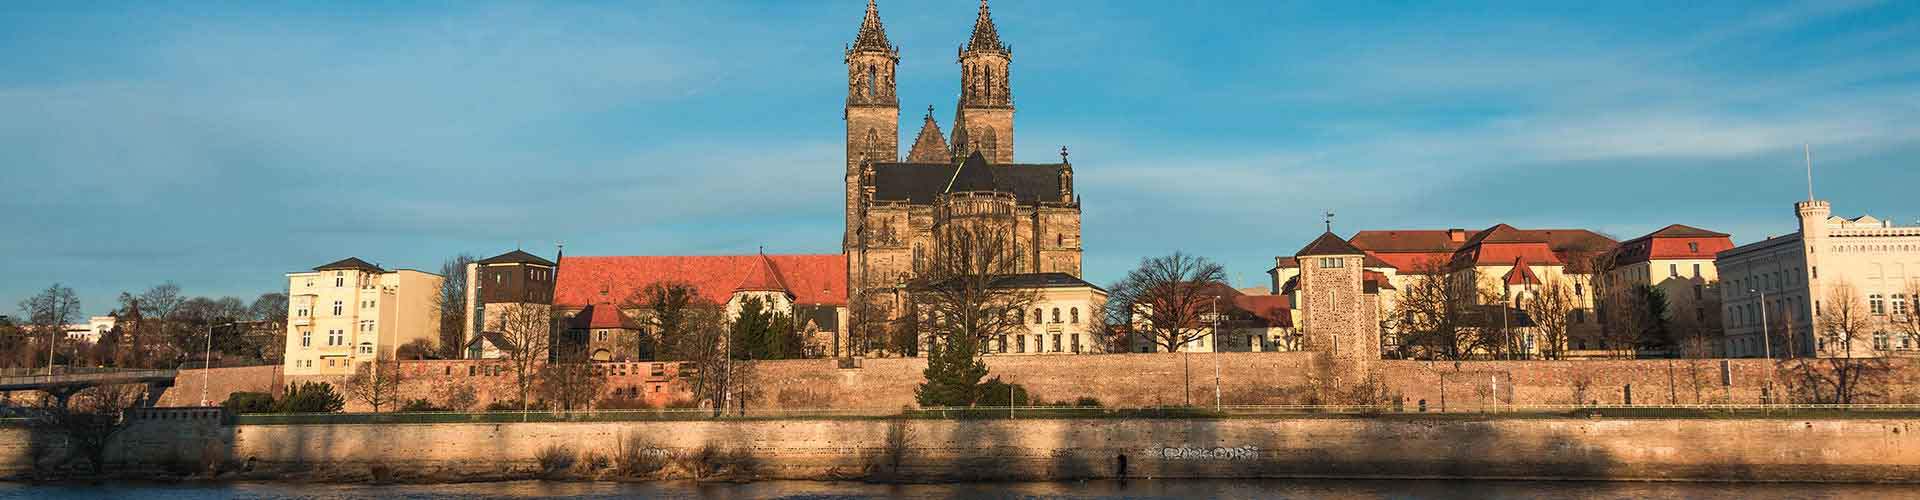 Magdeburg - Hostele w mieście: Magdeburg, Mapy: Magdeburg, Zdjęcia i Recenzje dla każdego hostelu w mieście Magdeburg.